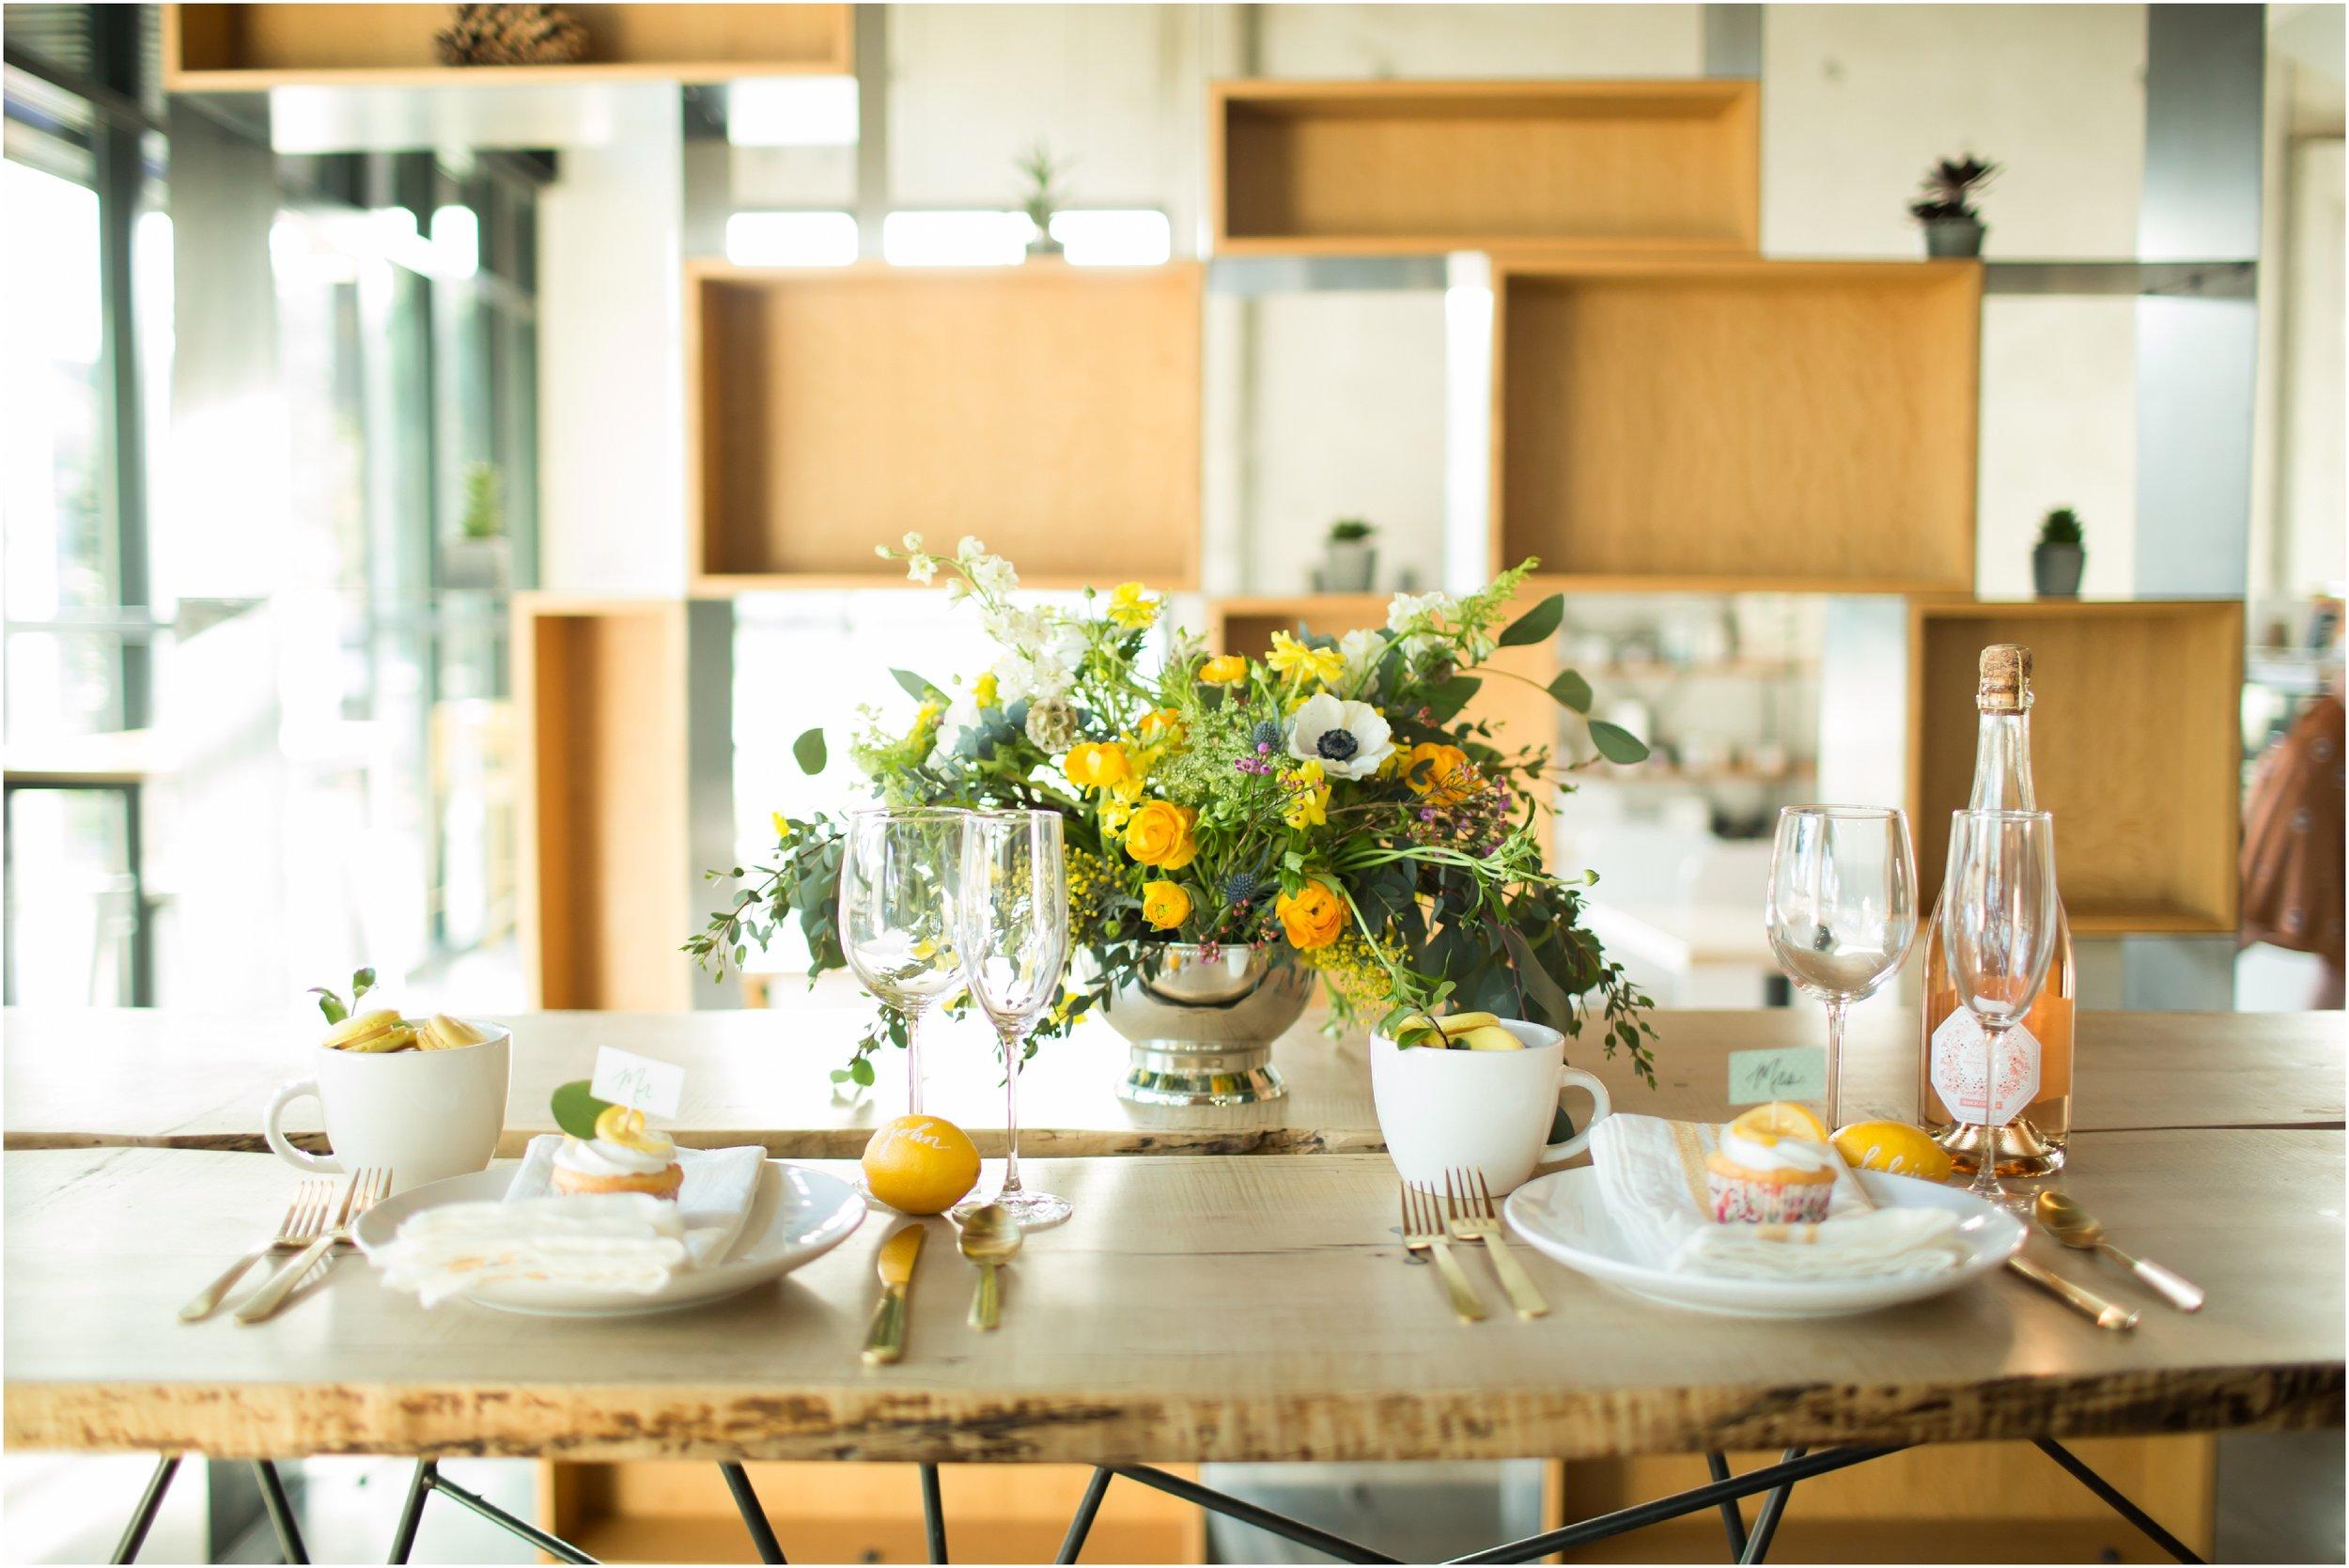 John + Kelcie - Wedding Florals - Floral Design - Ashley Hur - Hip Hip Hooray Dot Love